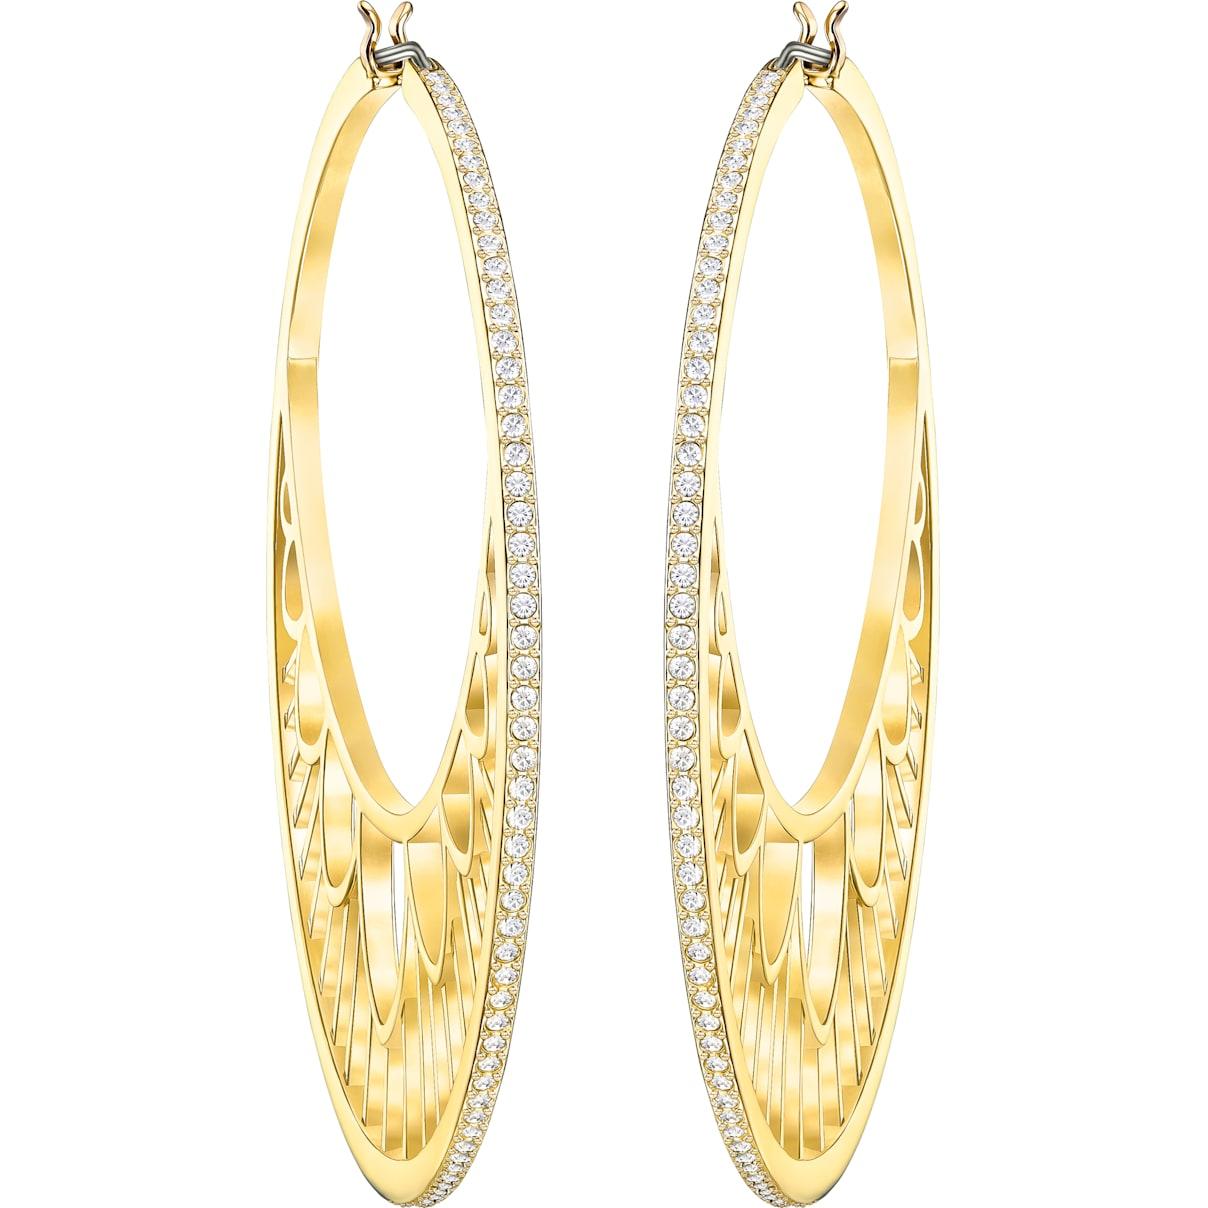 Swarovski Georgette Hoop Pierced Earrings, White, Gold-tone plated